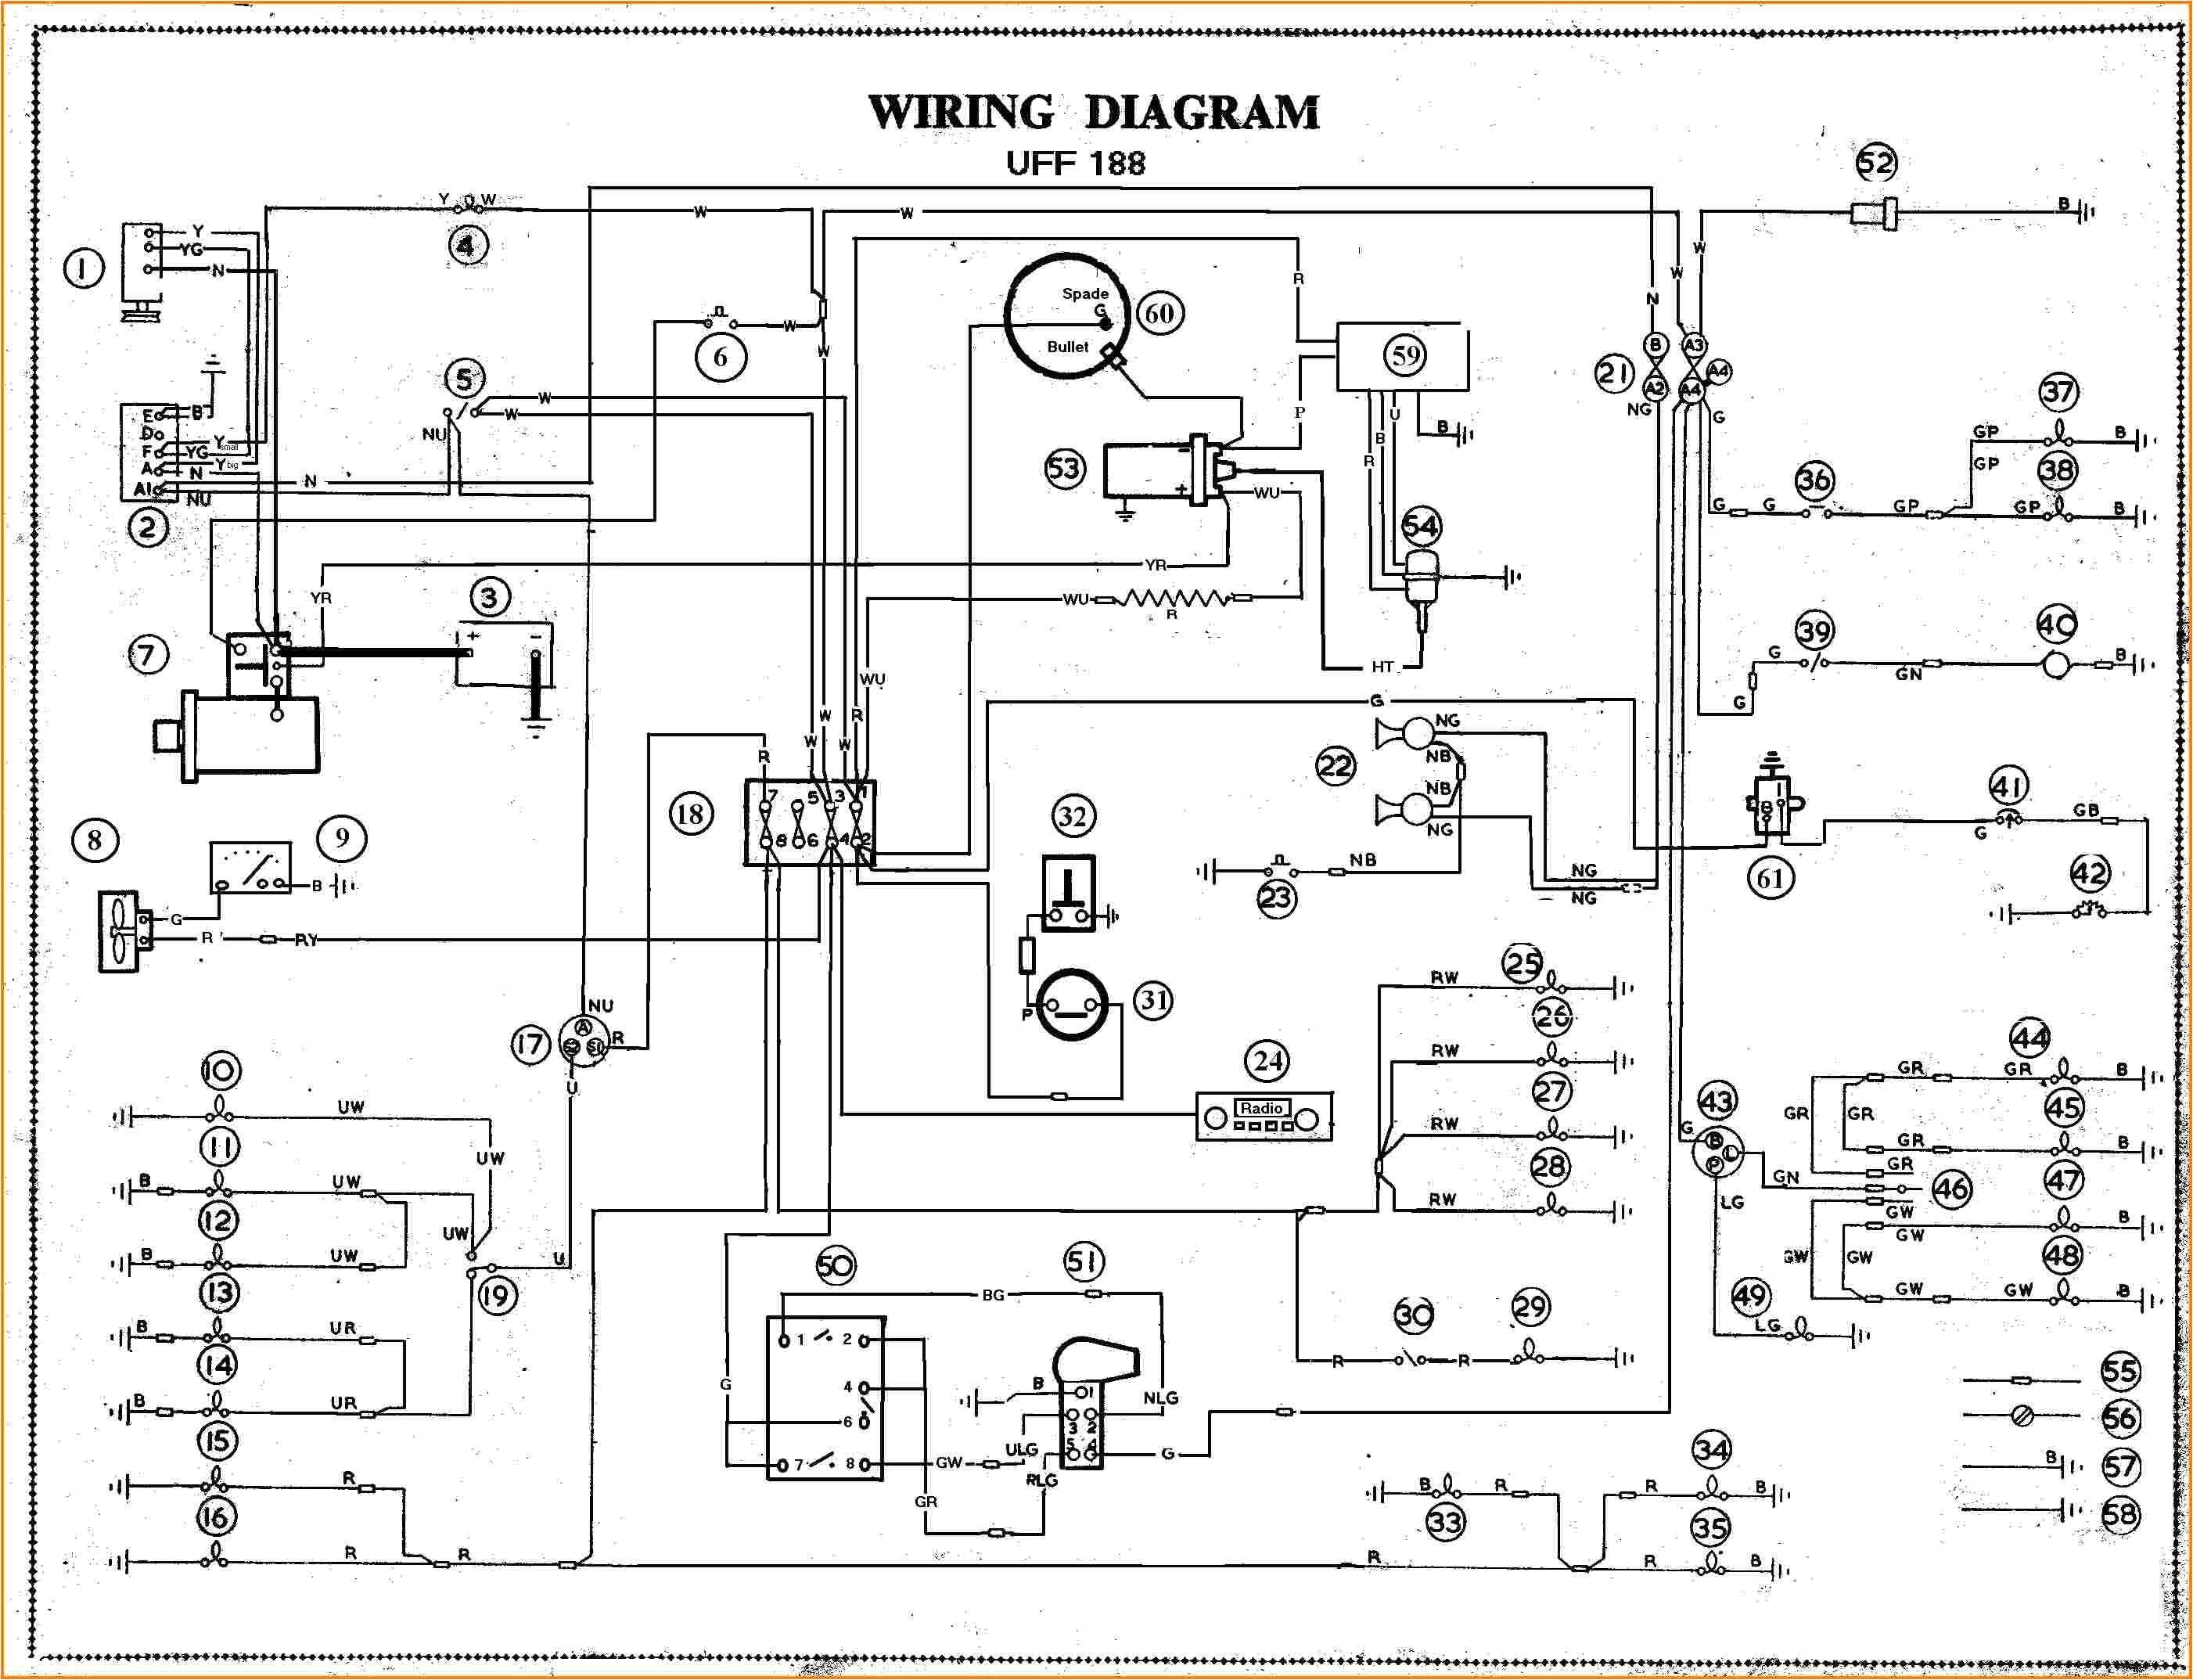 auto wiring diagrams wiring diagrams konsult auto wiring diagrams for sale